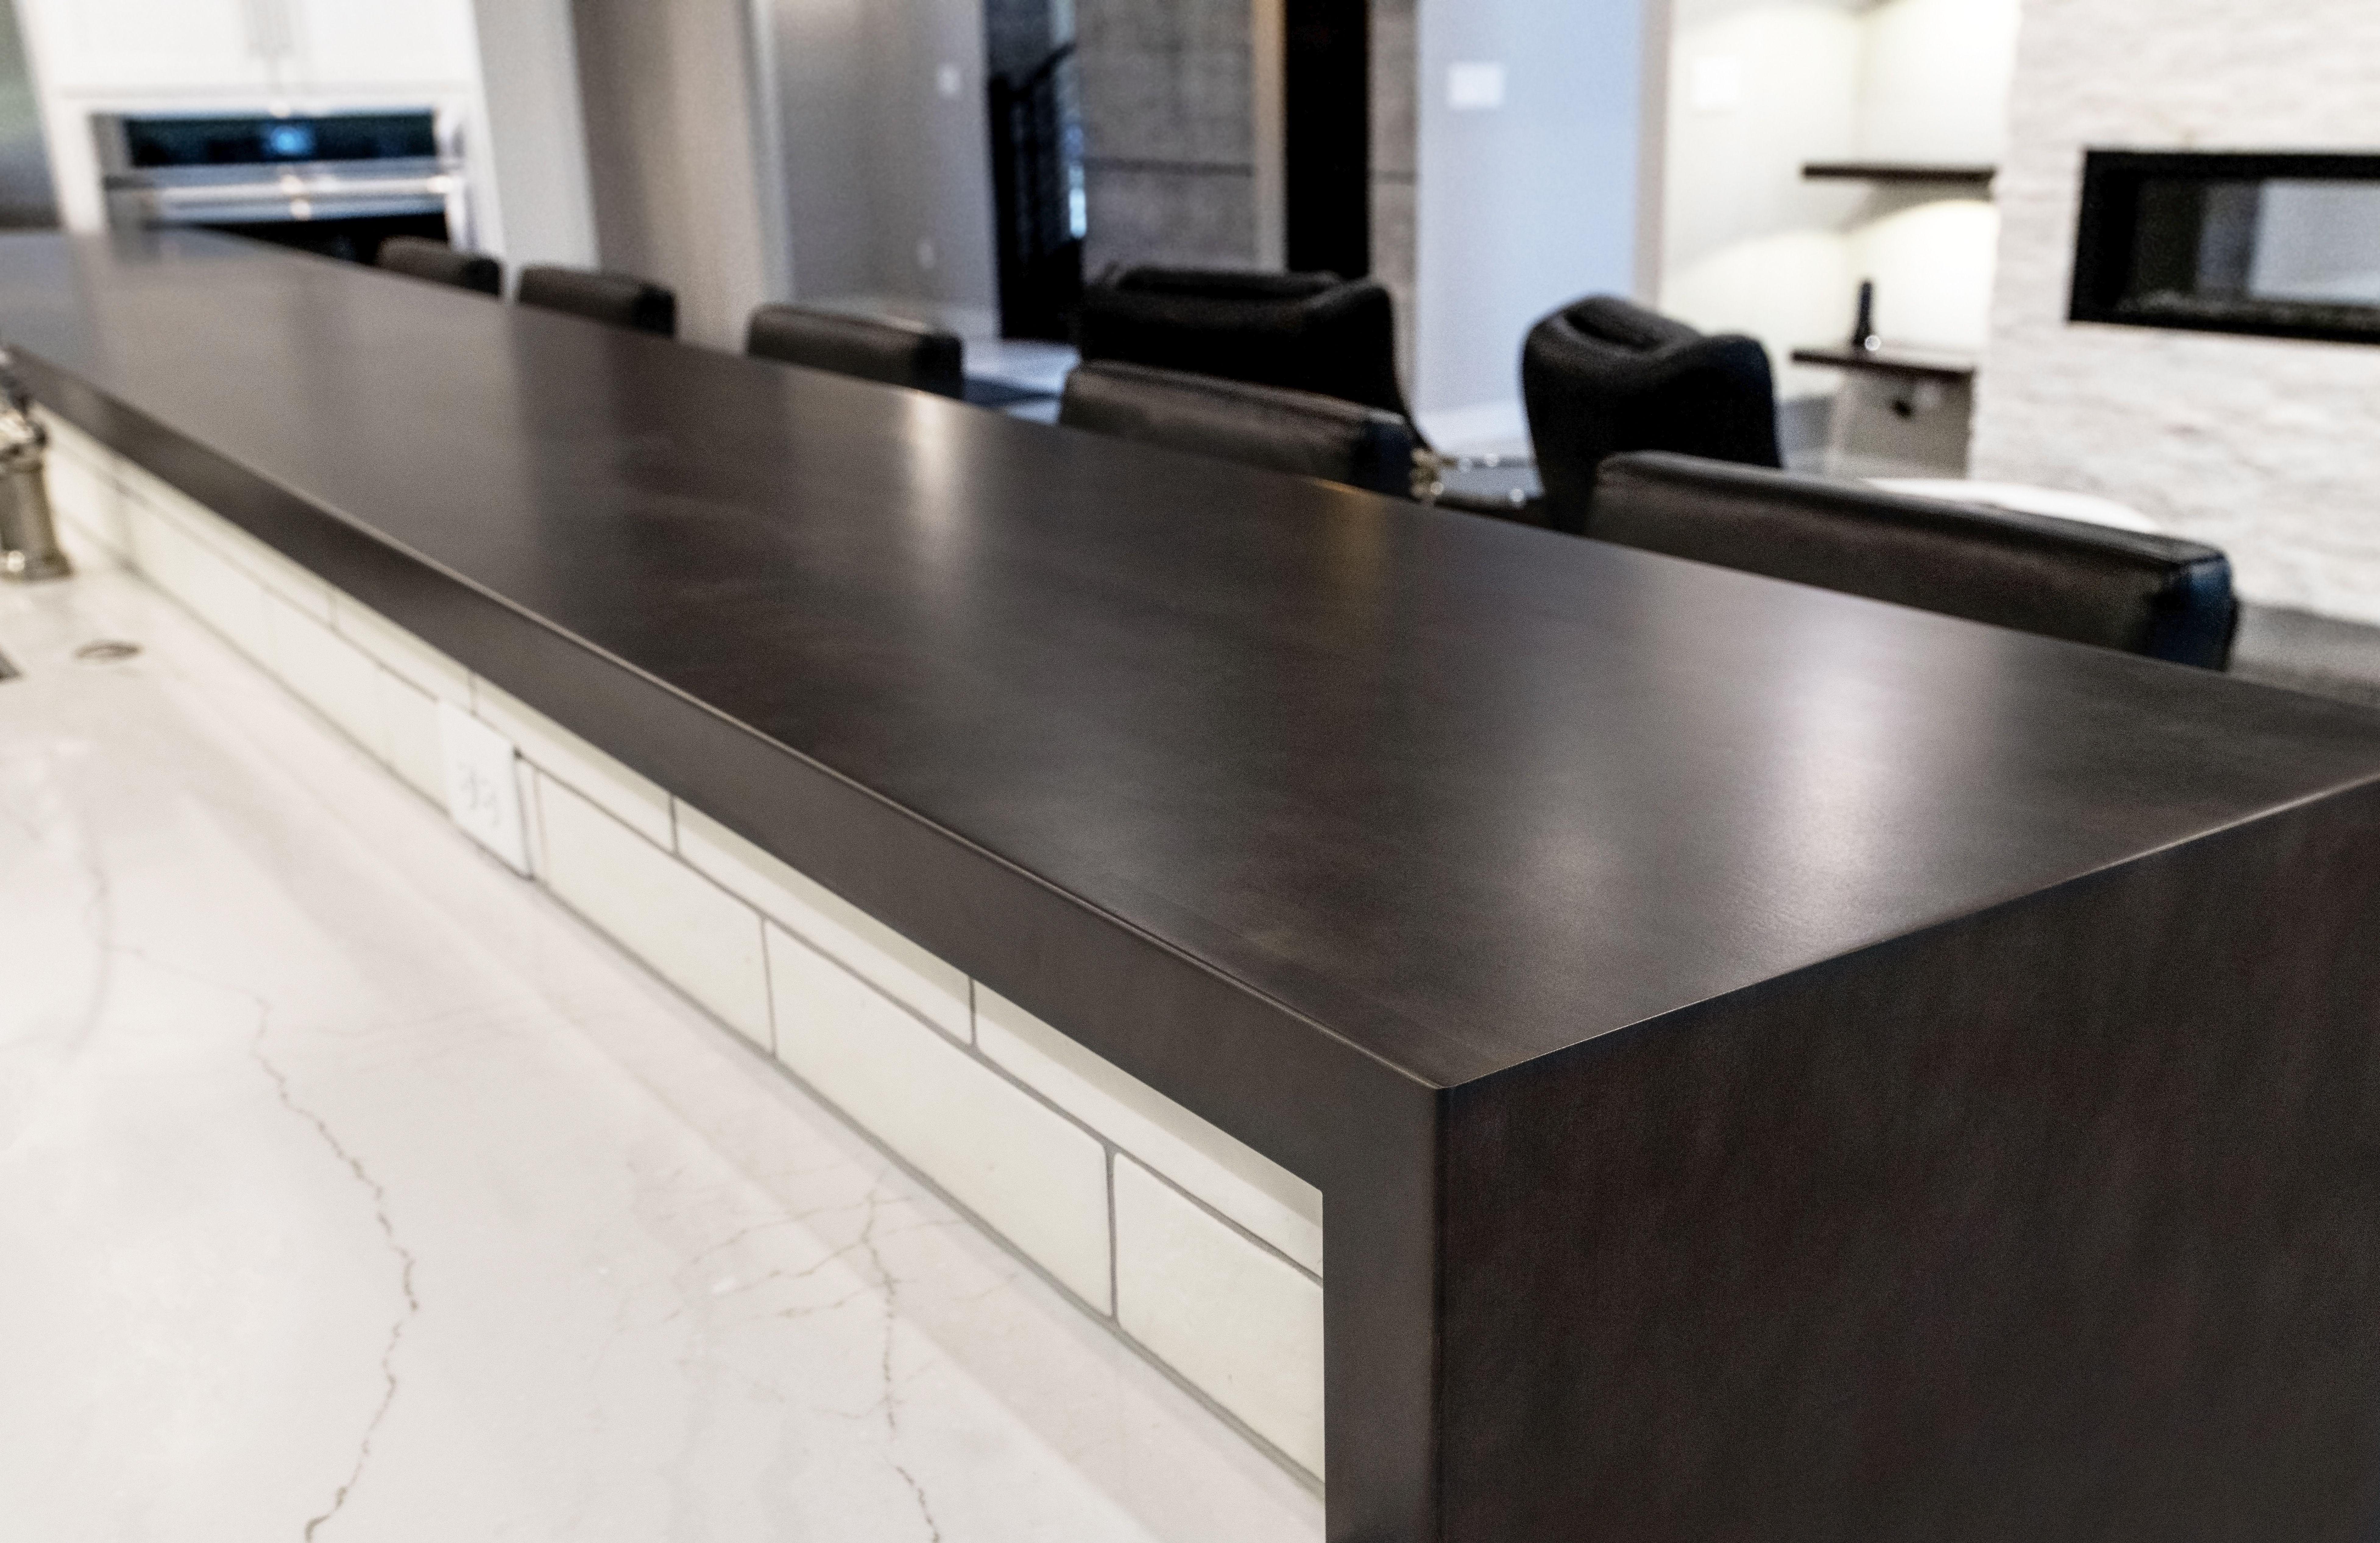 Cambria Granite Kitchen Countertops St Louis Missouri Vanity Counters Tops Manufacturing Countertops Granite Countertops Kitchen Home Room Design